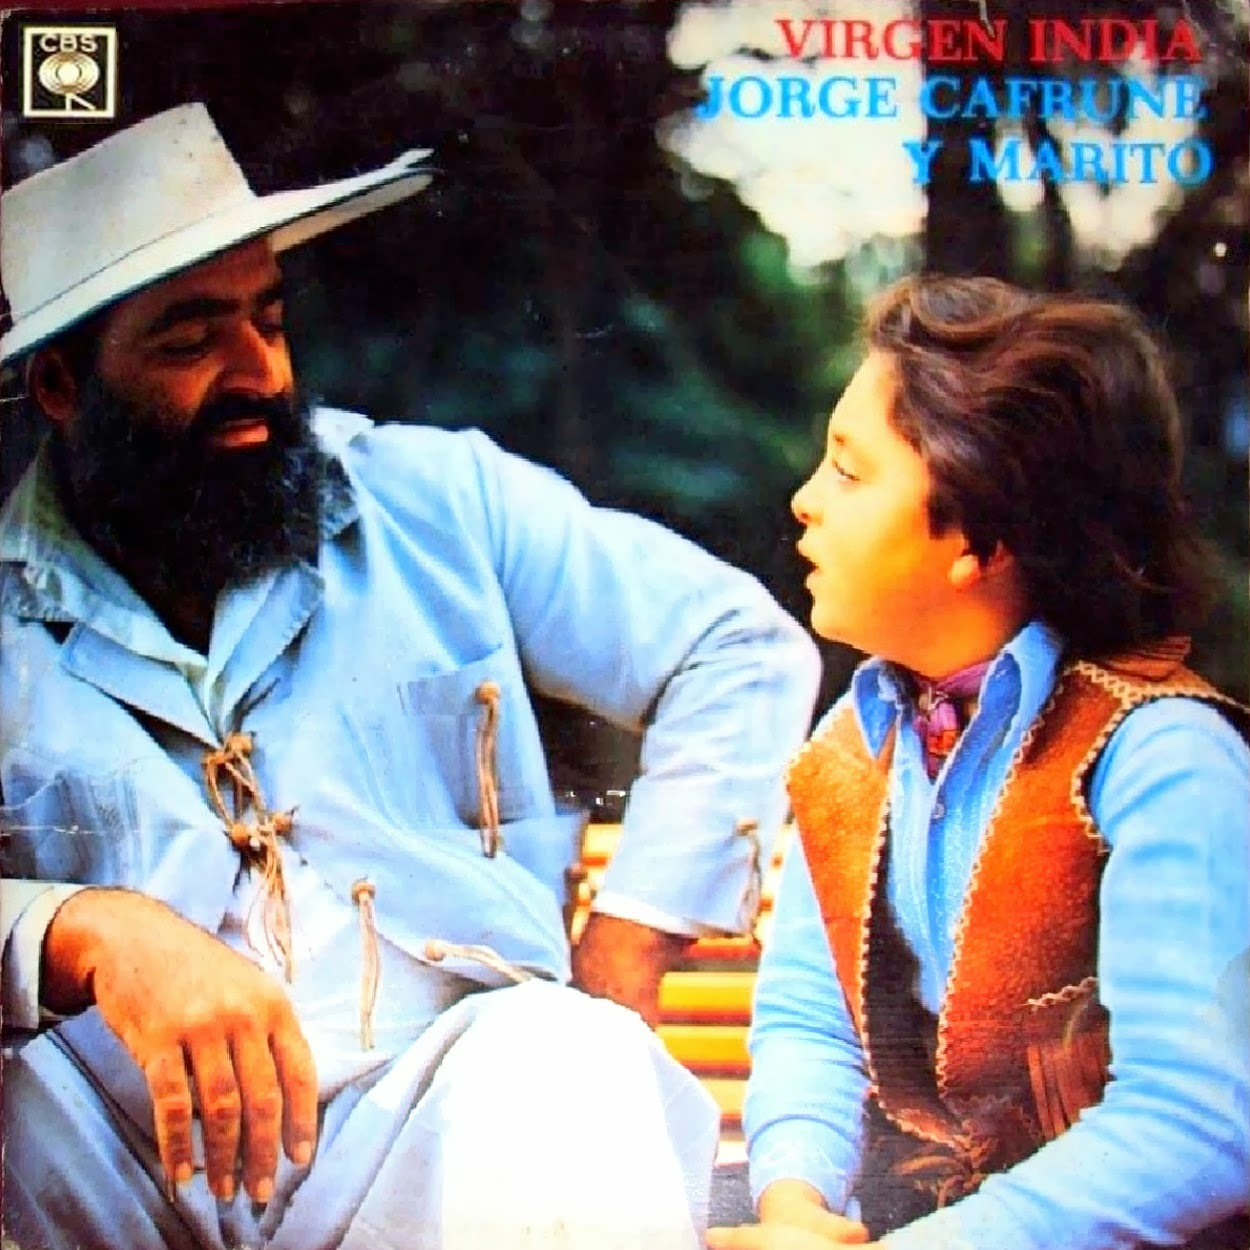 JORGE CAFRUNE - VIRGEN INDIA - JORGE CAFRUNE Y MARITO - CBS LD Nº 9147 (1972)